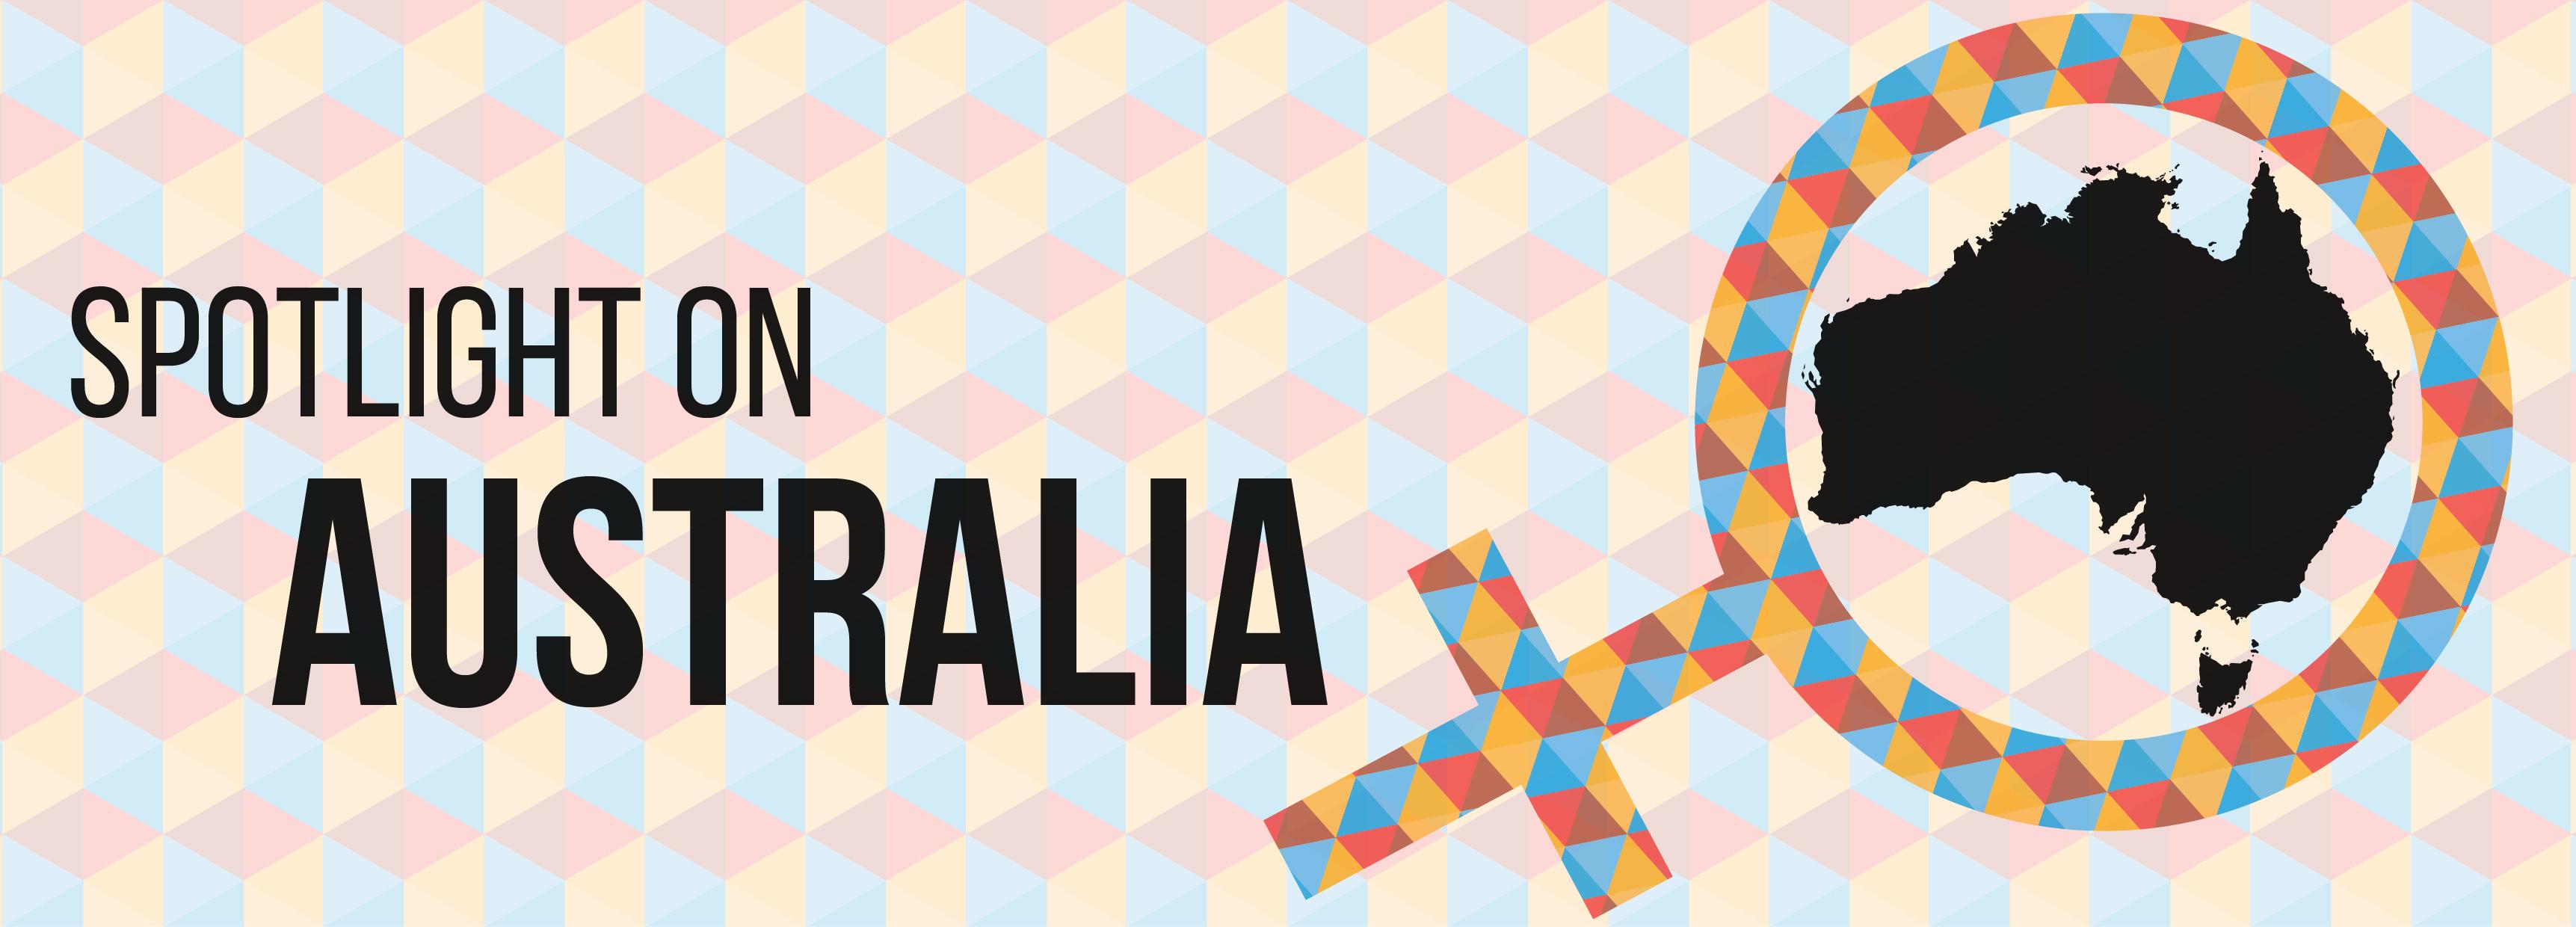 Blog Headers_spotlight on Aus